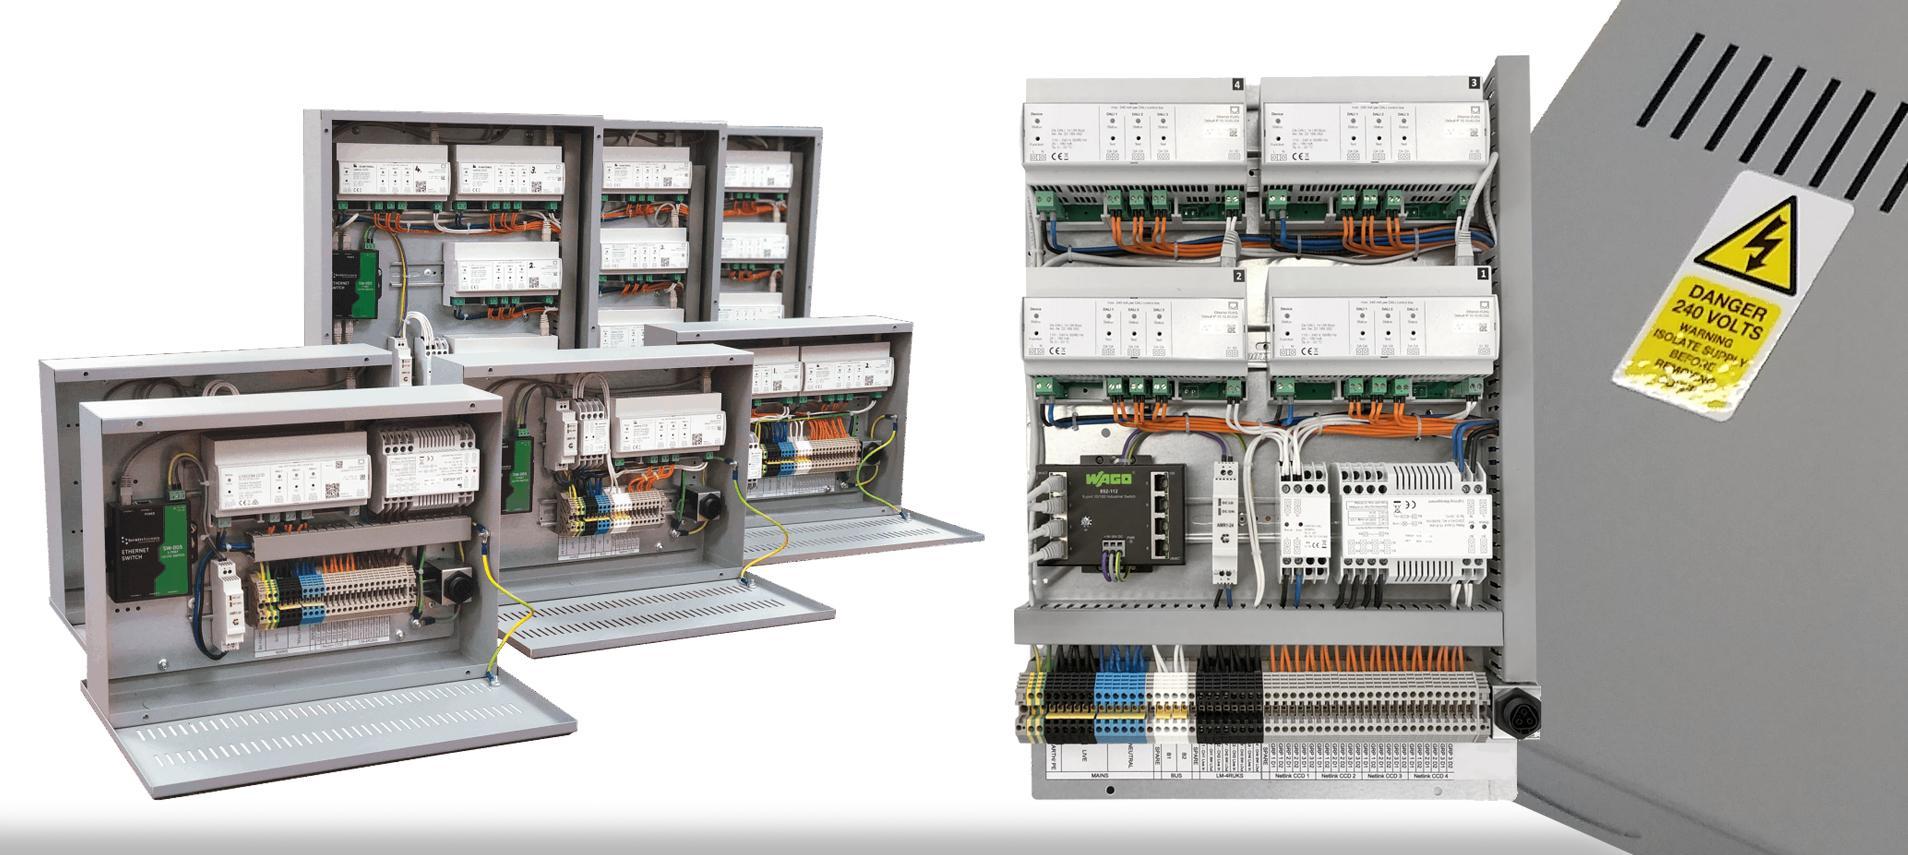 Lighting control panel manufacturer